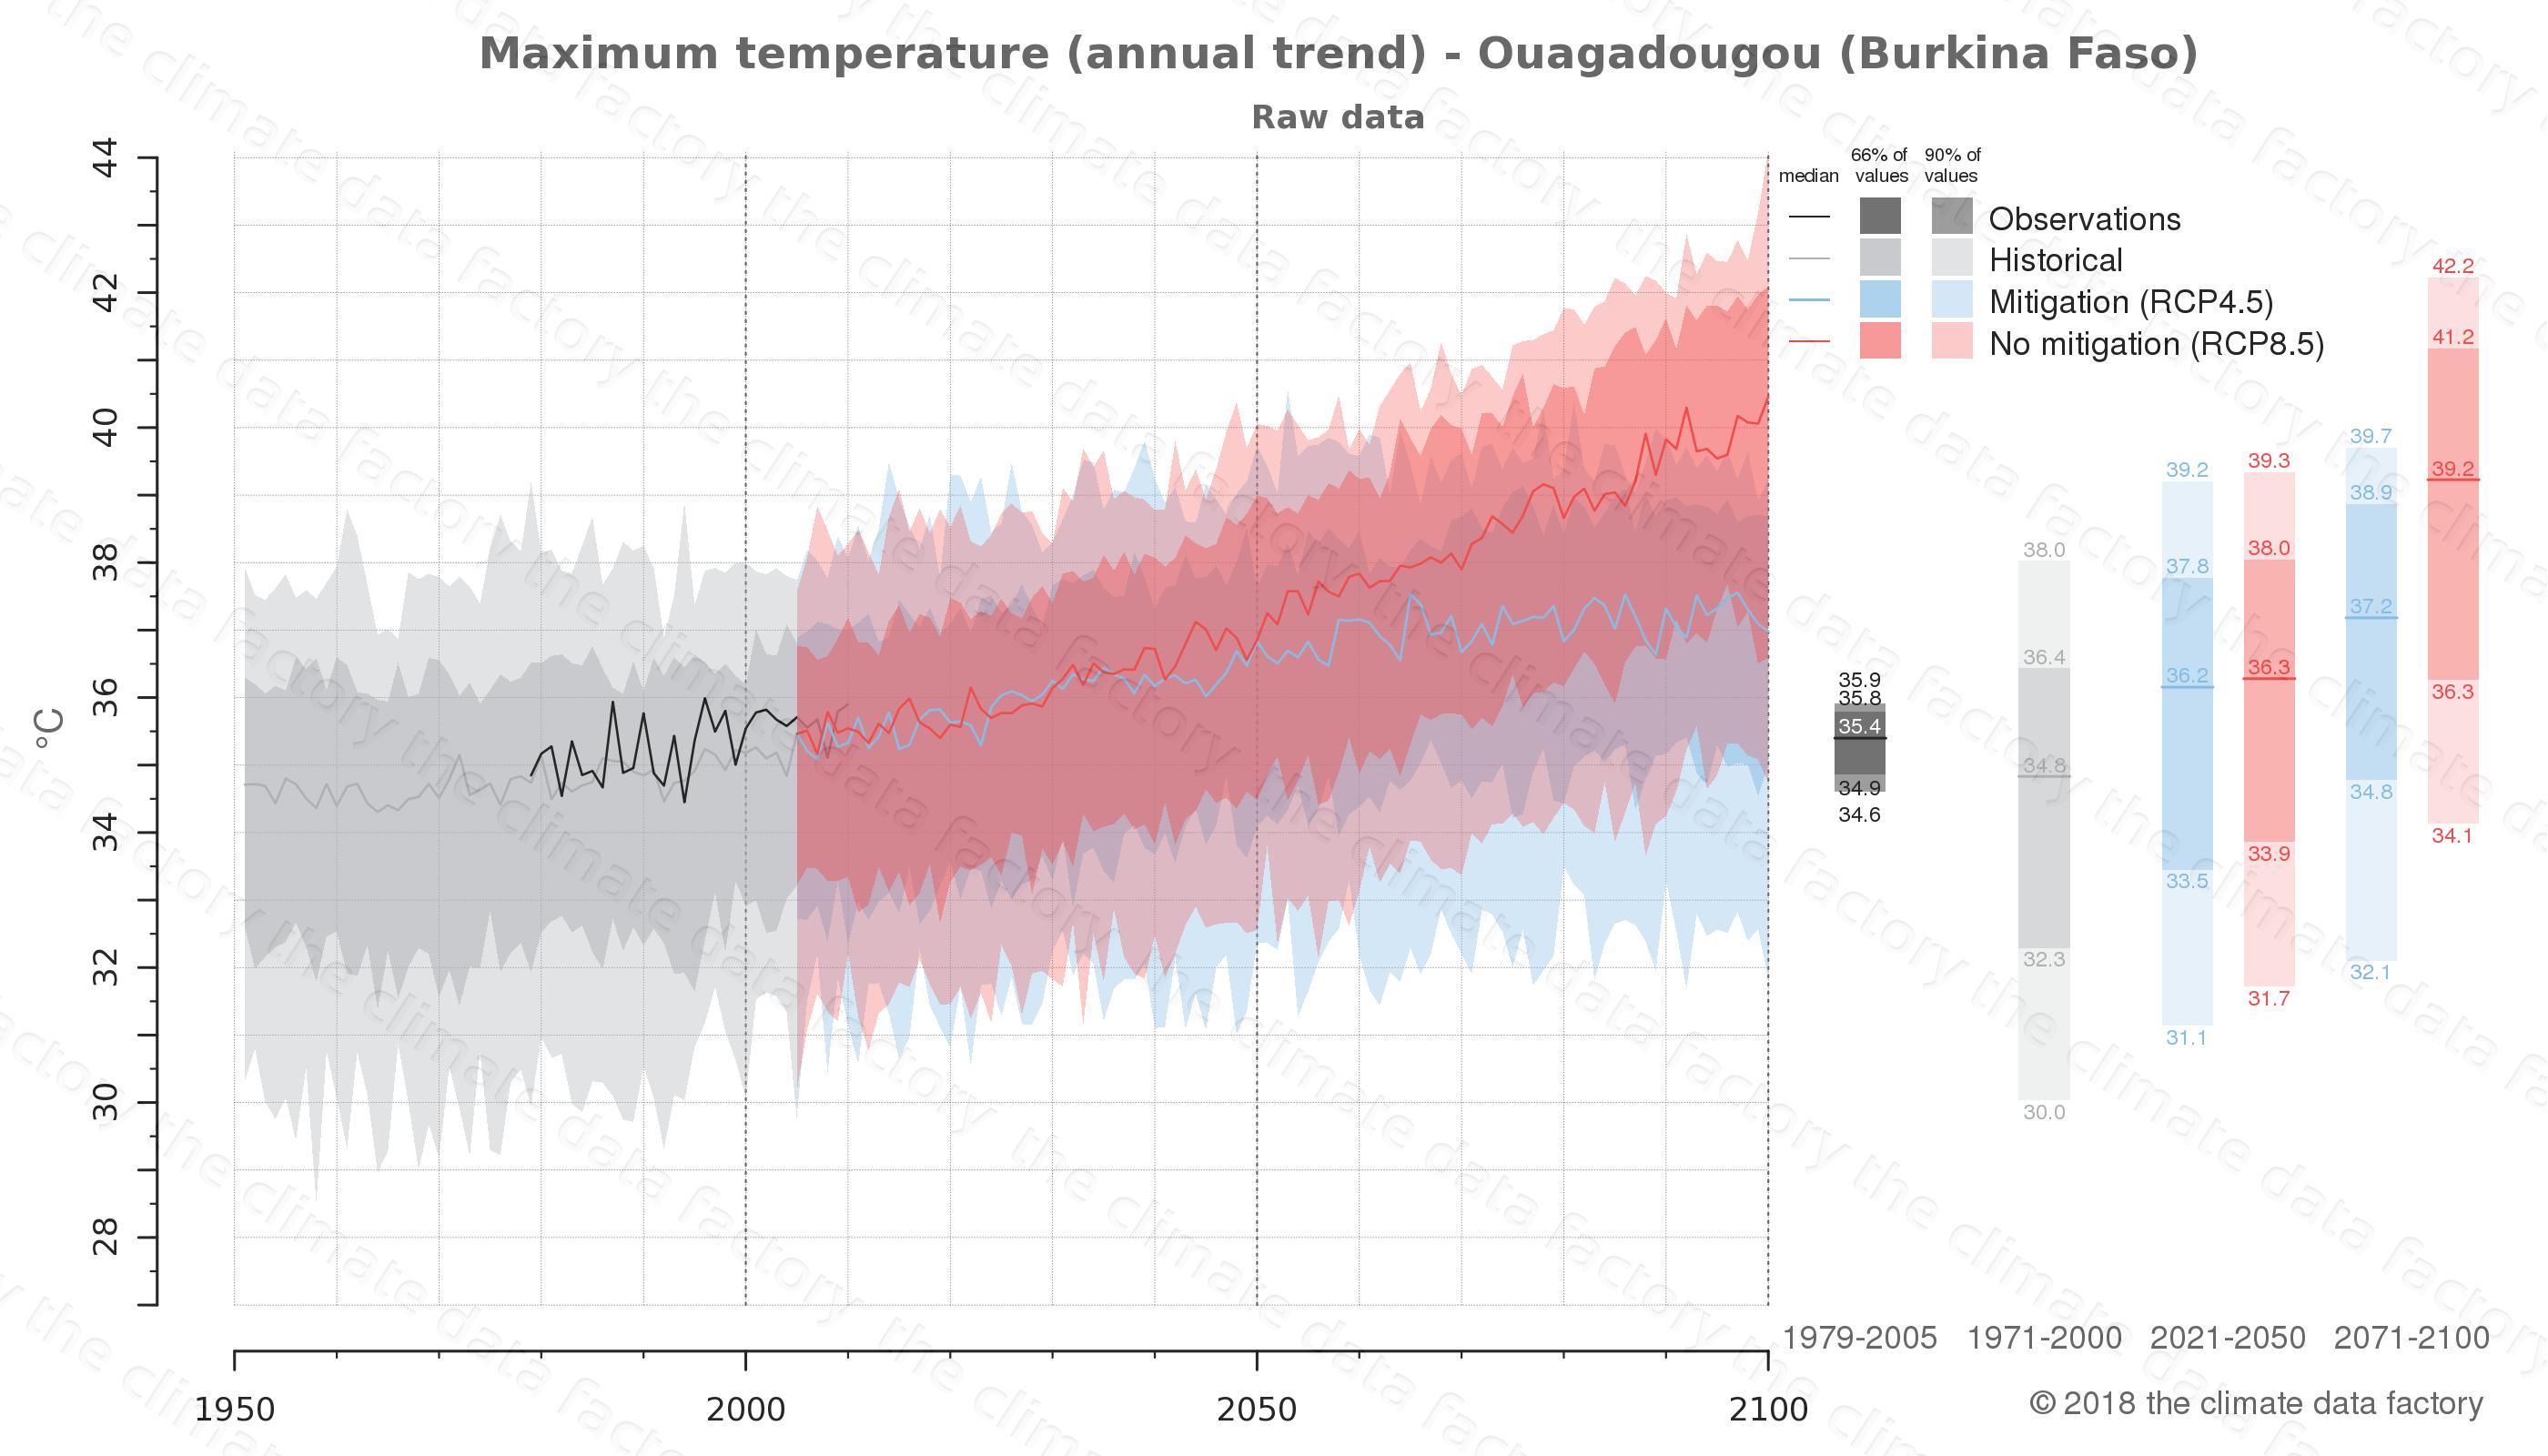 climate change data policy adaptation climate graph city data maximum-temperature ouagadougou burkina faso